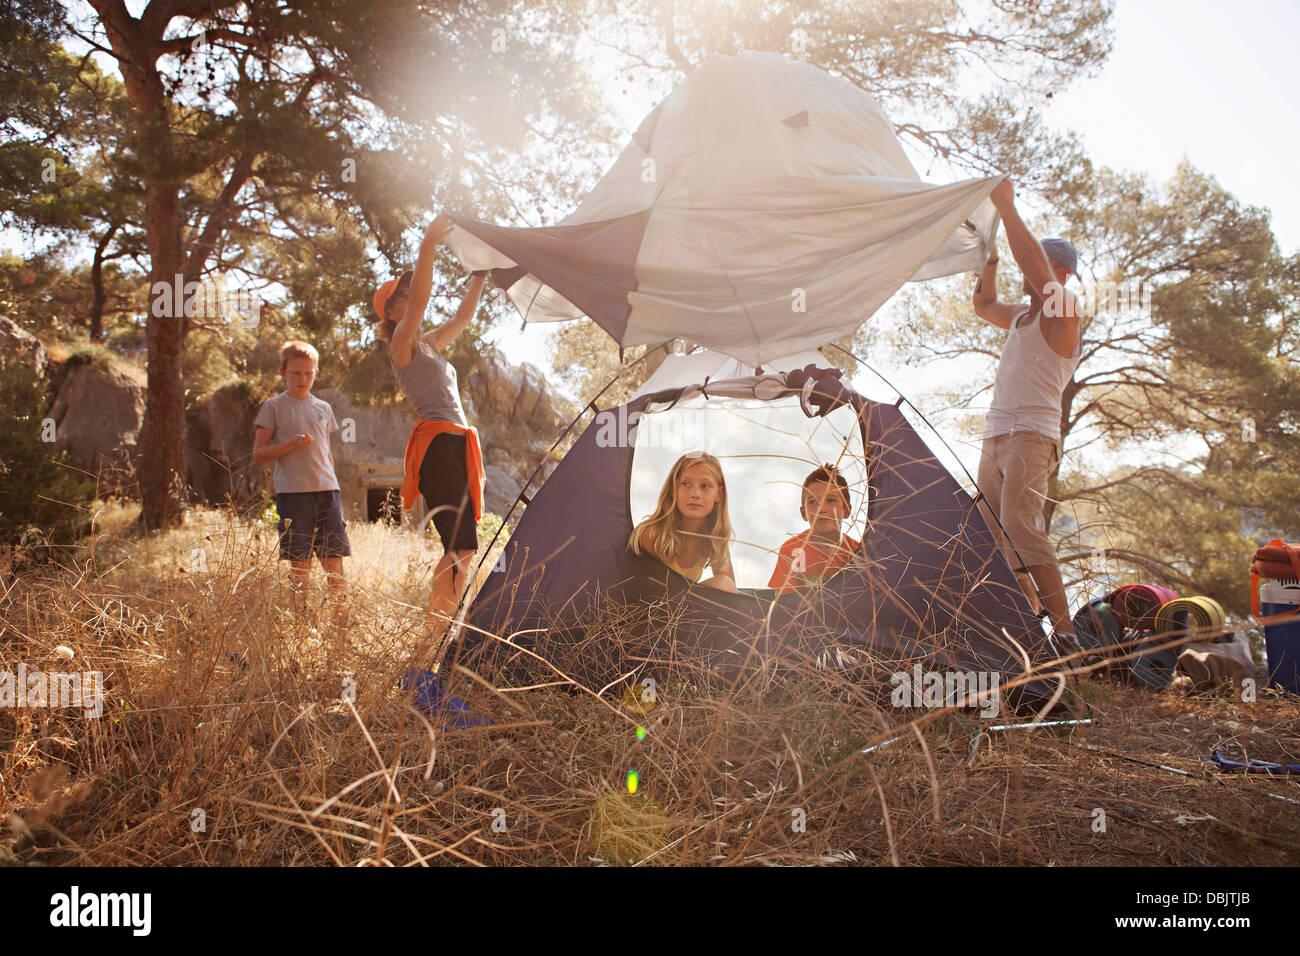 Kroatien, Dalmatien, Familienurlaub am Campingplatz, pitching der Zelt Stockbild